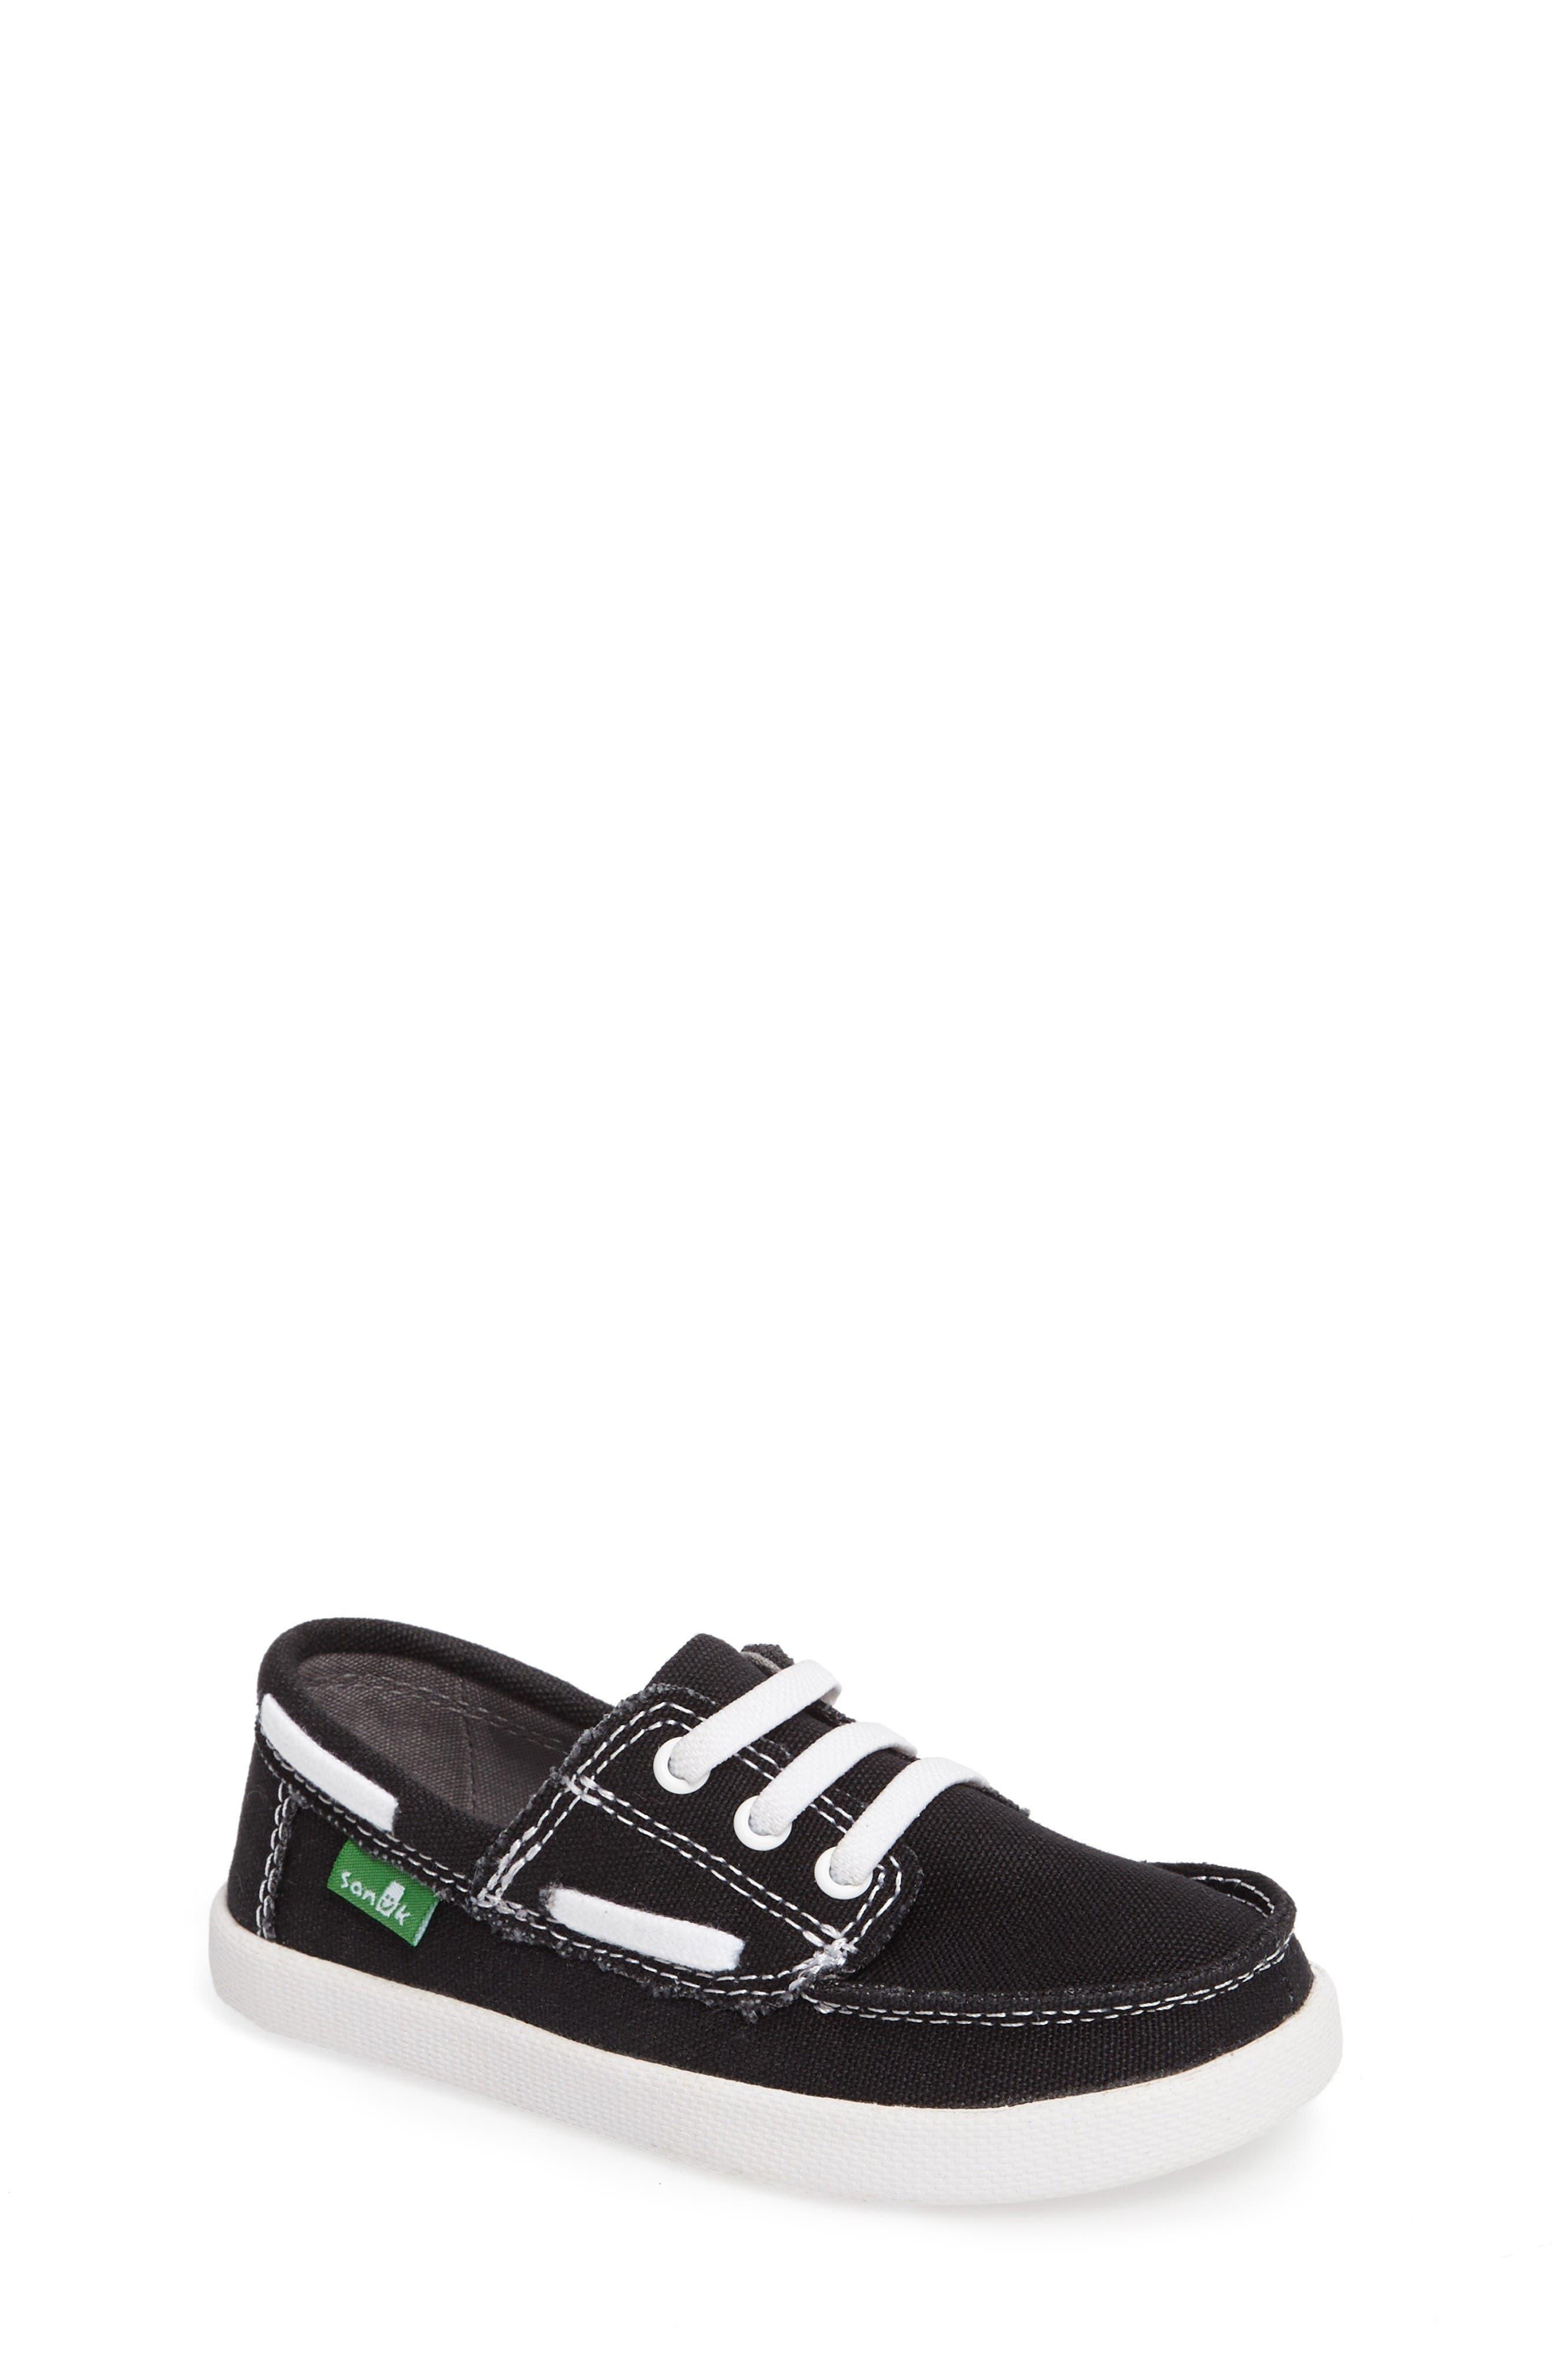 Lil Deck Hand Slip-On Sneaker,                         Main,                         color, Black